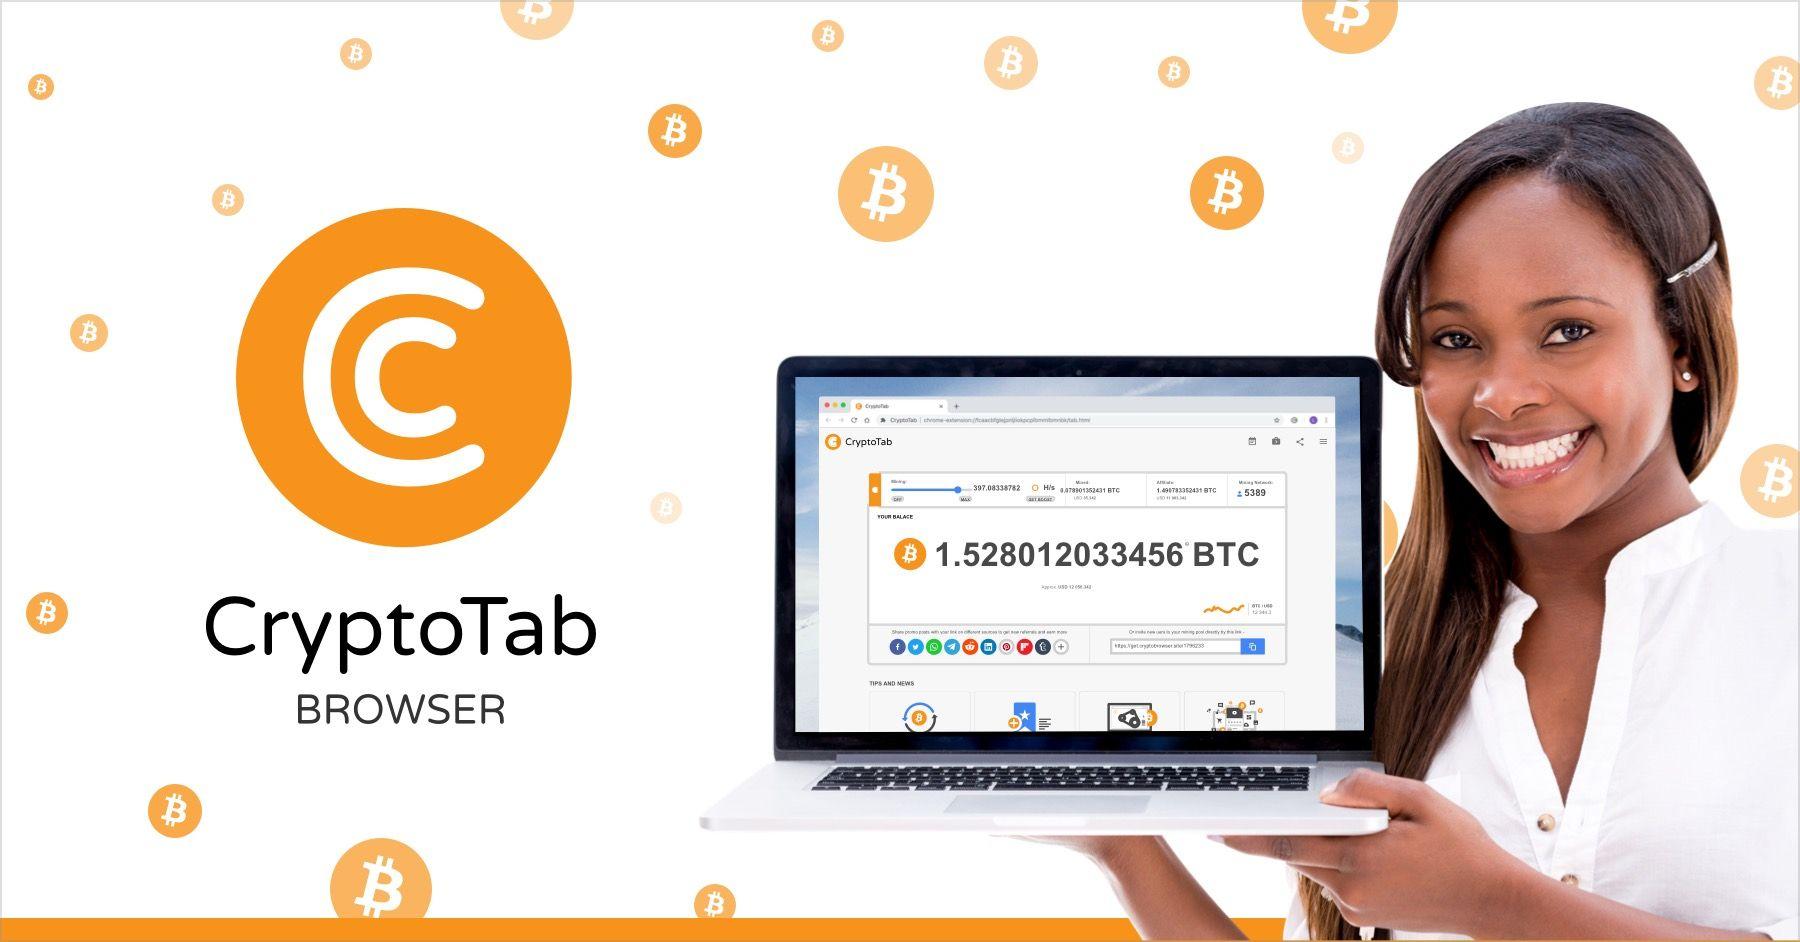 cryptotab browser forum mercato bitcoin in kenya